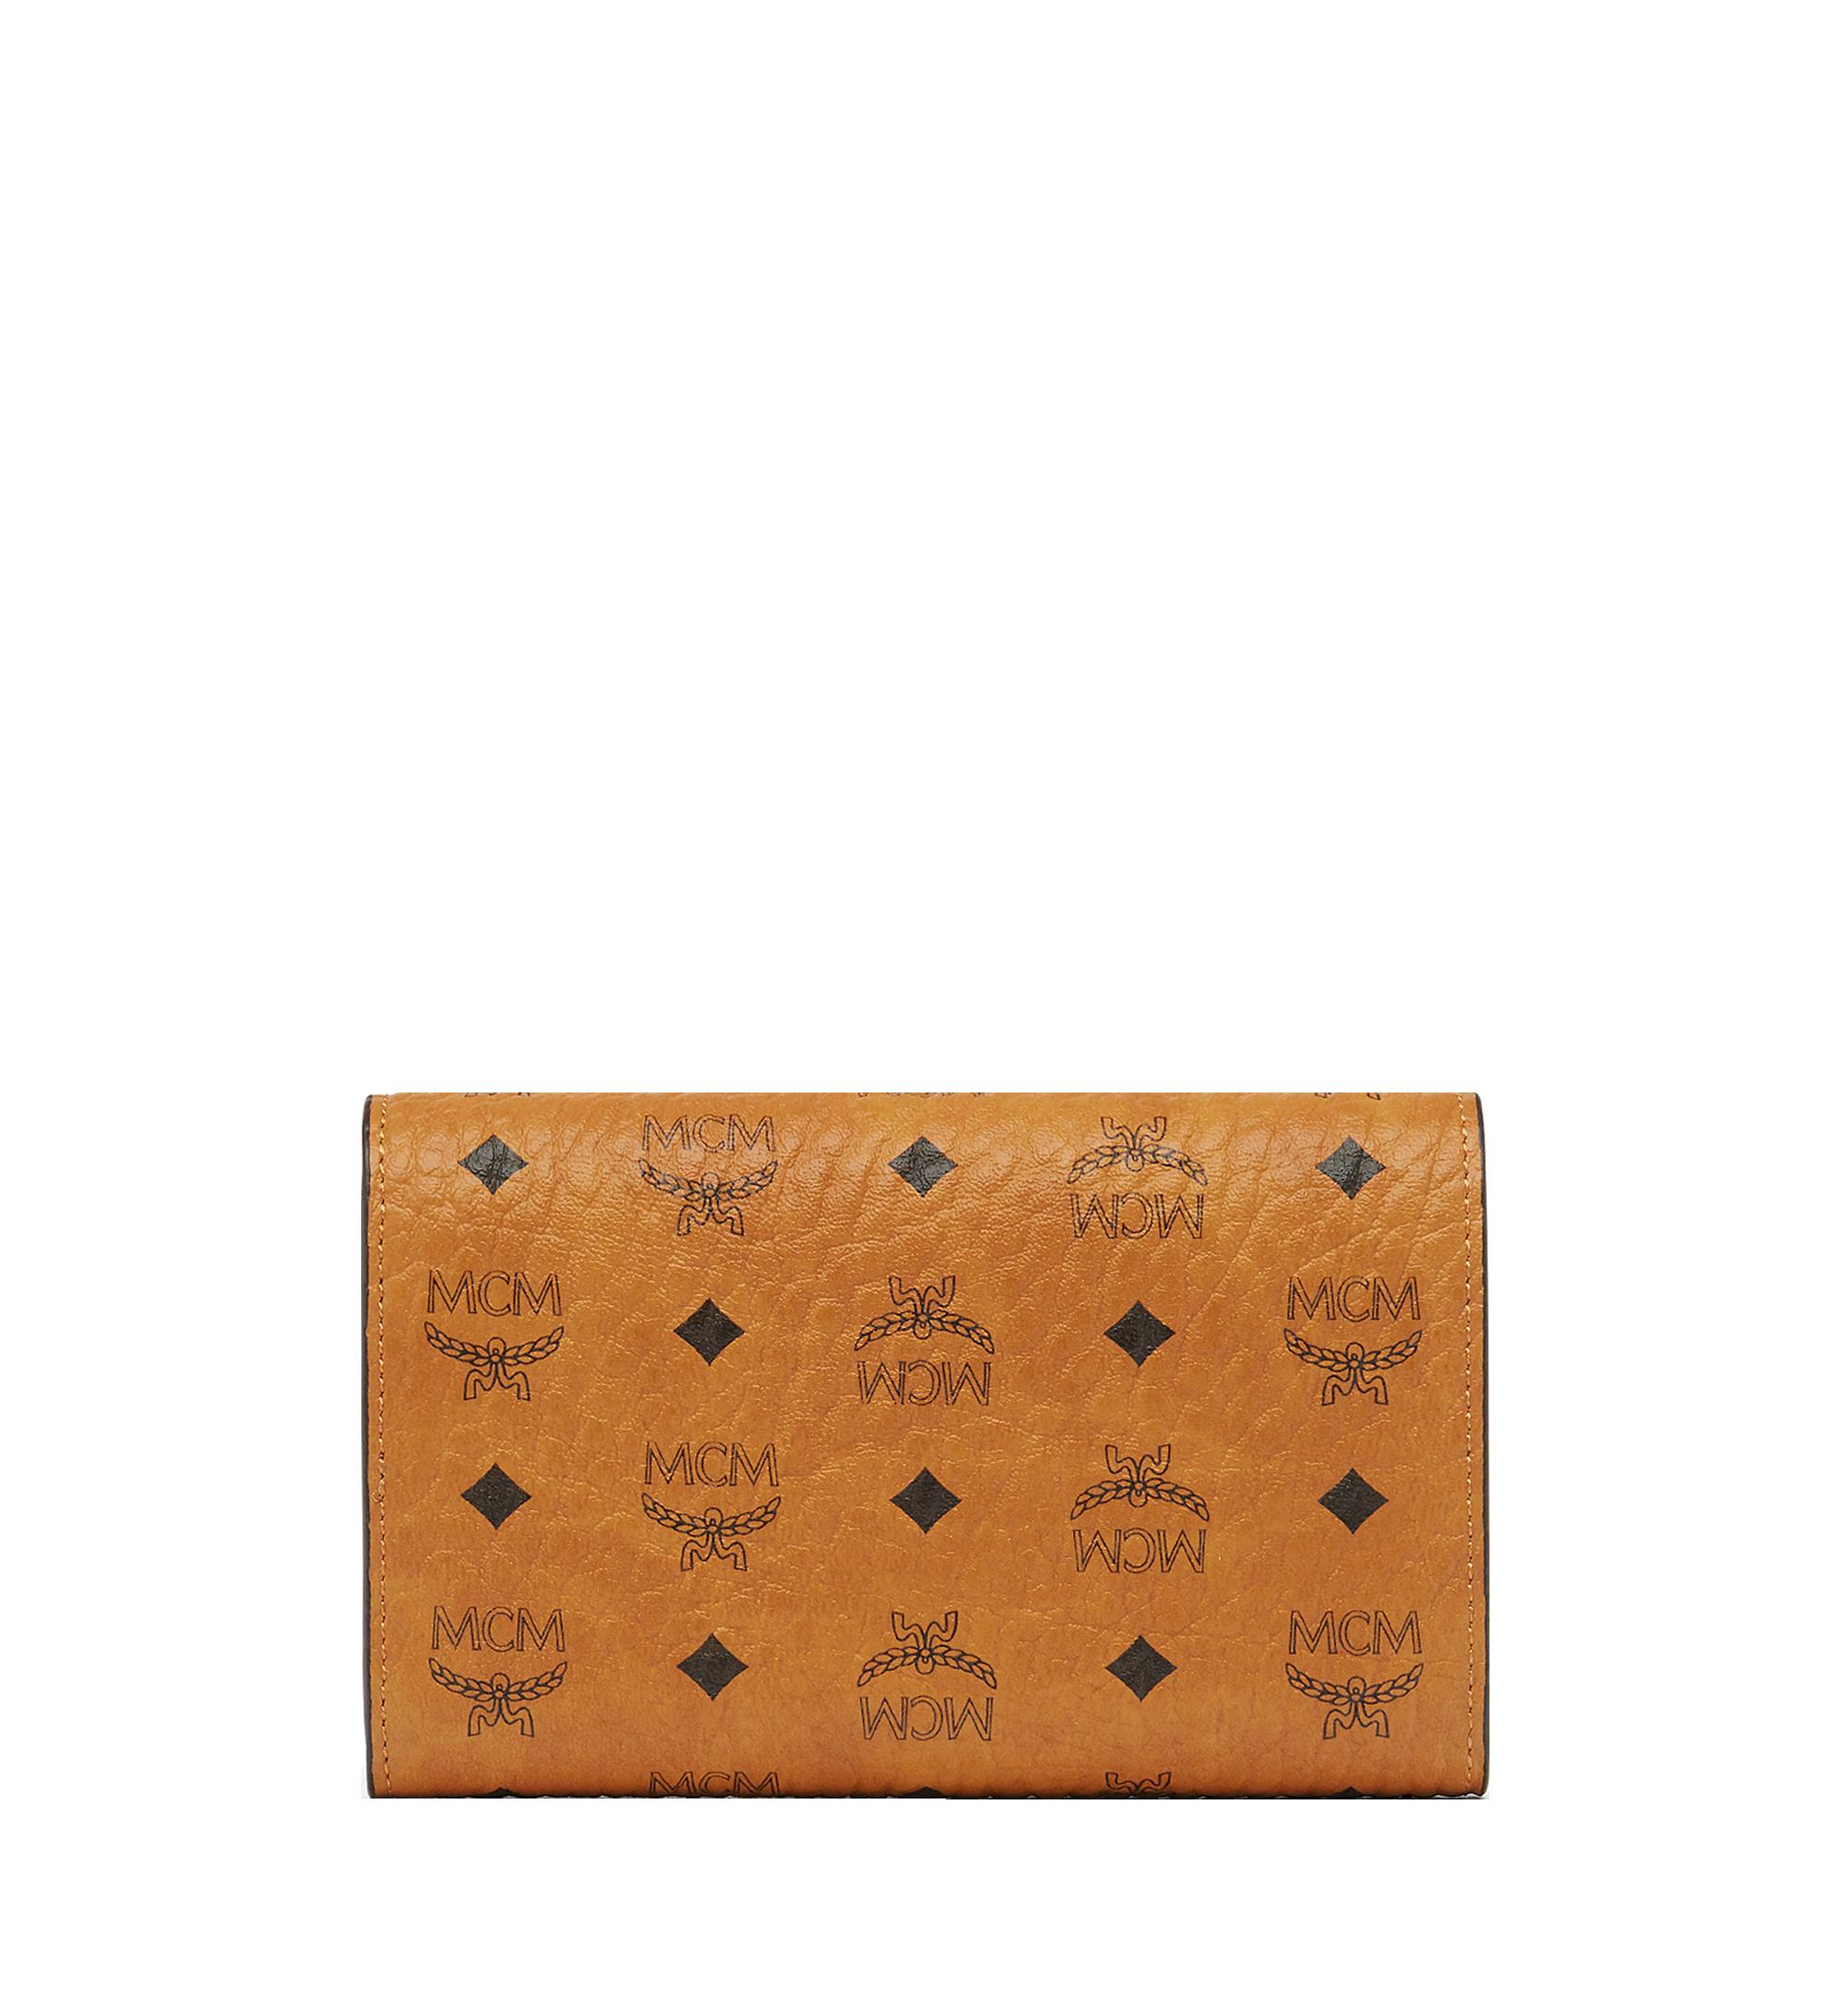 MCM Three Fold Wallet in Visetos Original Cognac MYM8SVI49CO001 更多视角 2